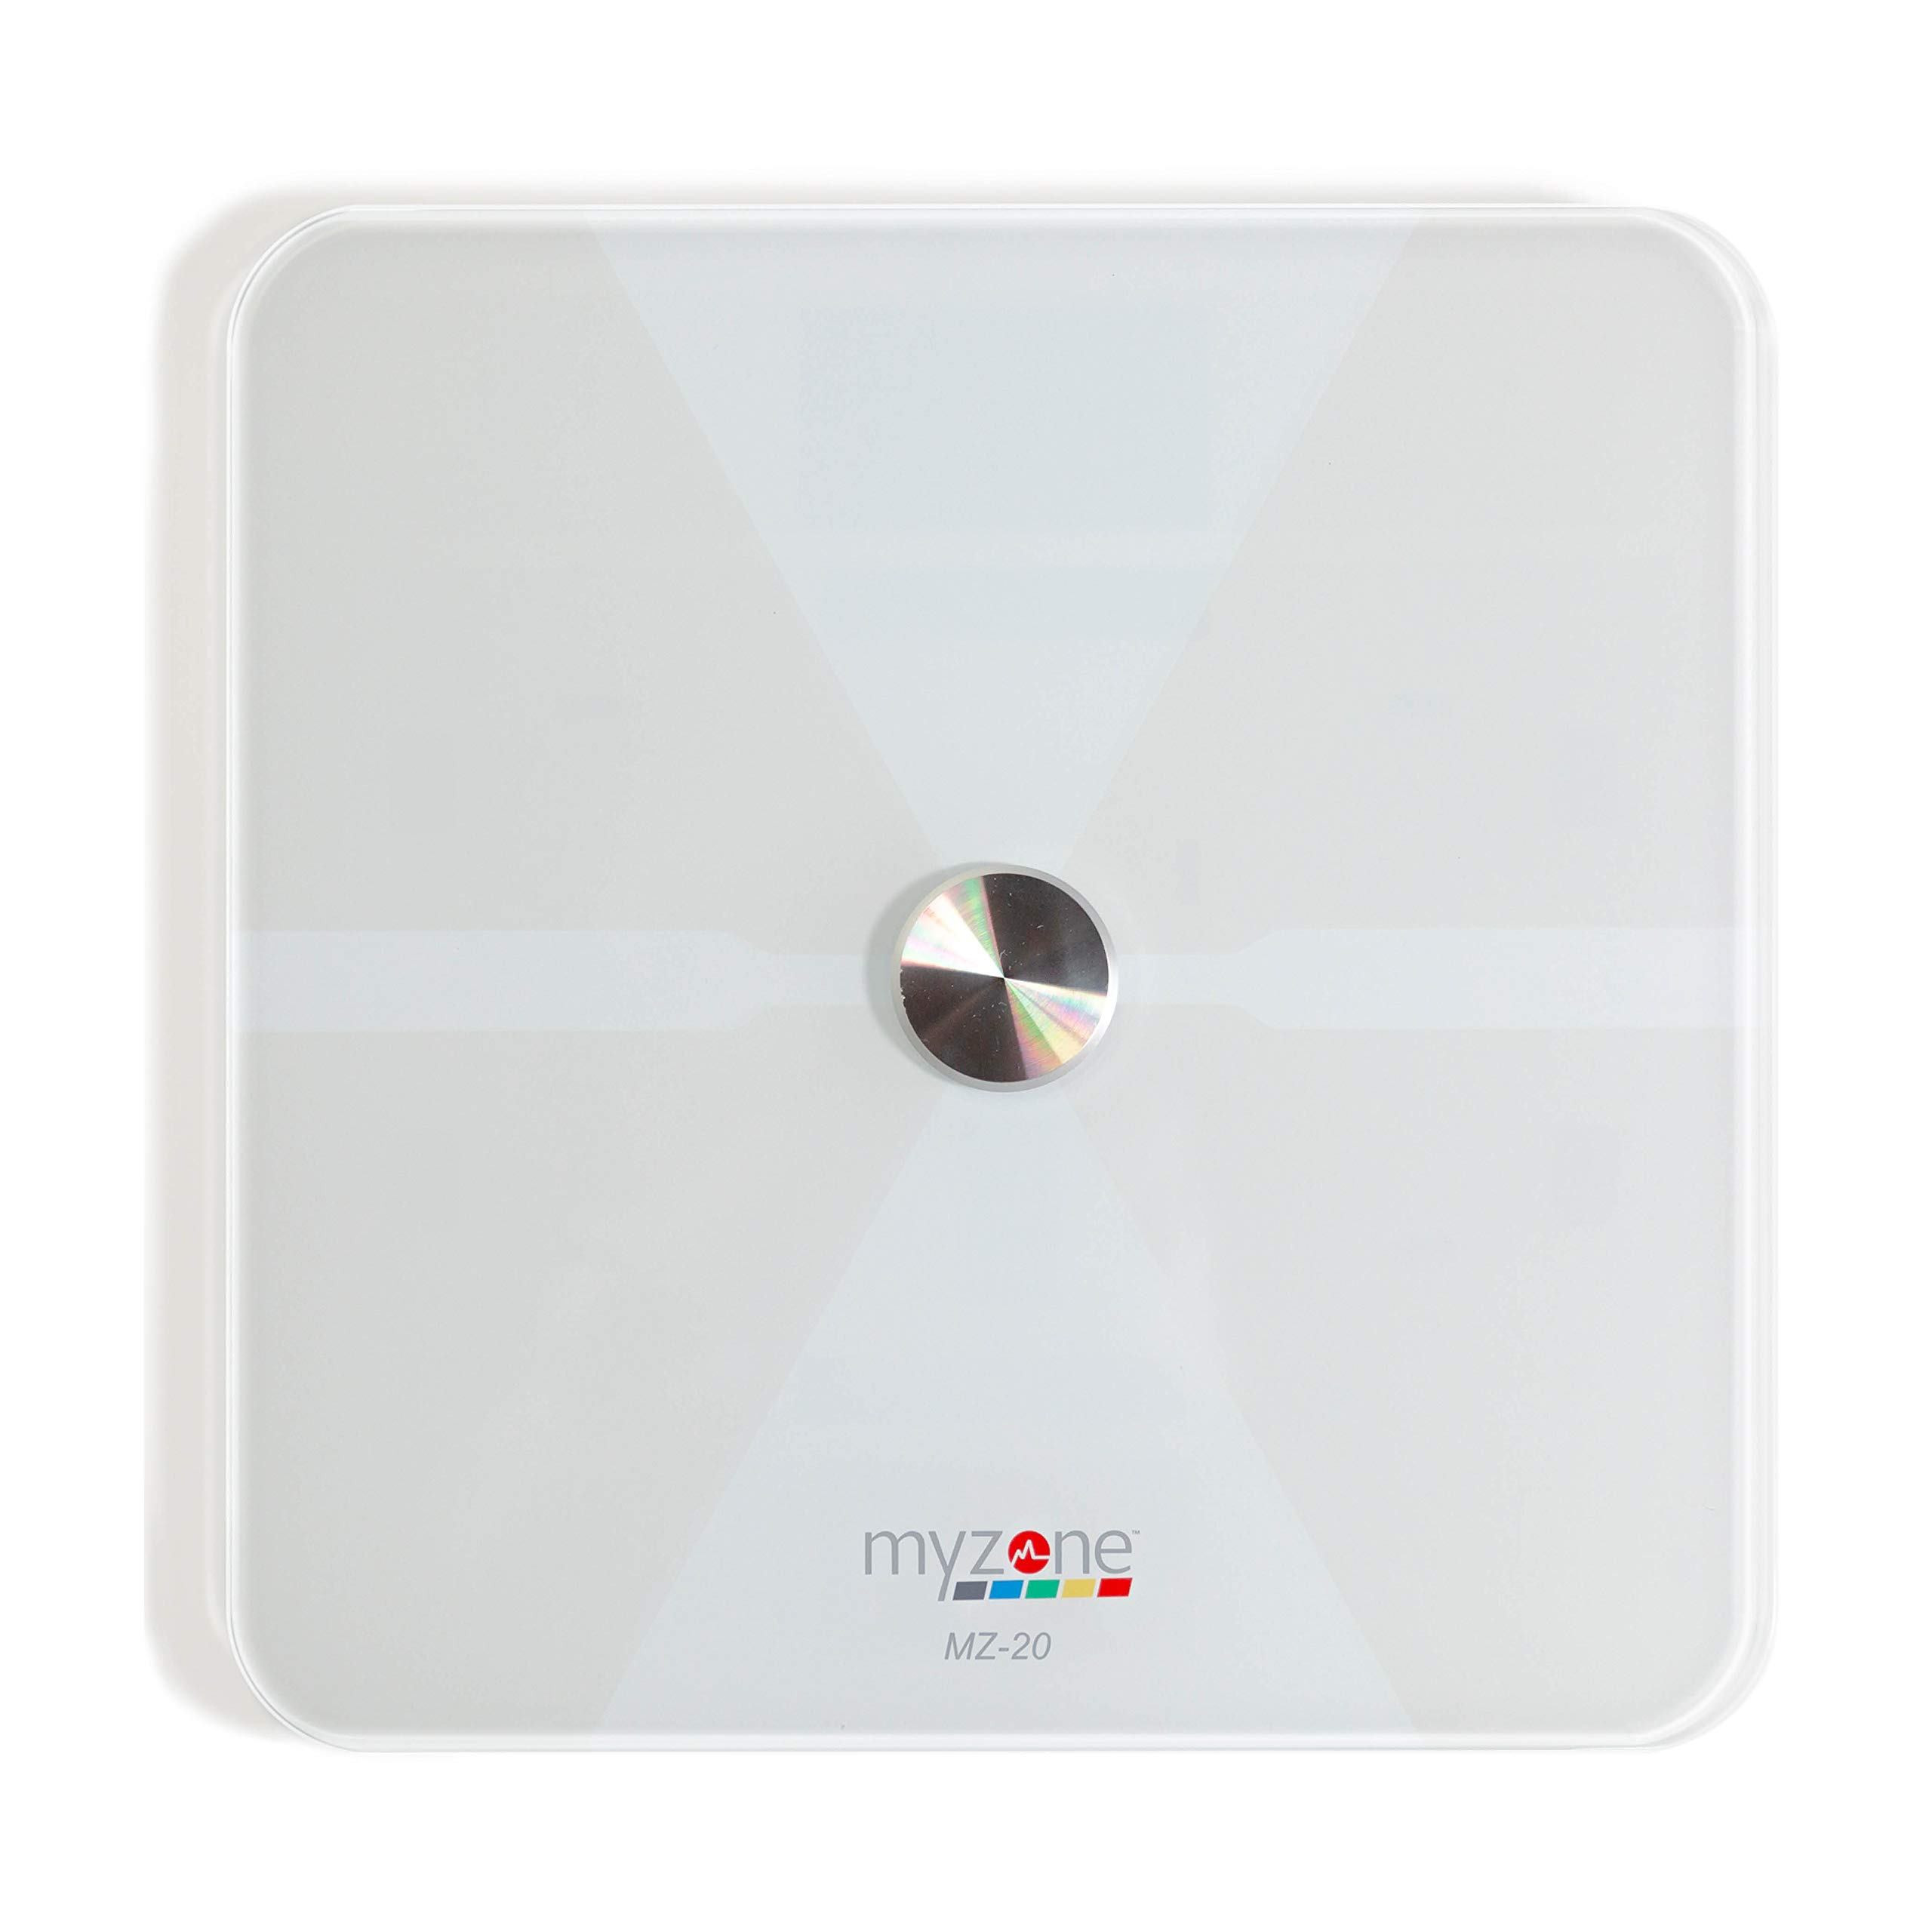 Myzone MZ-20 Home Scale (White)